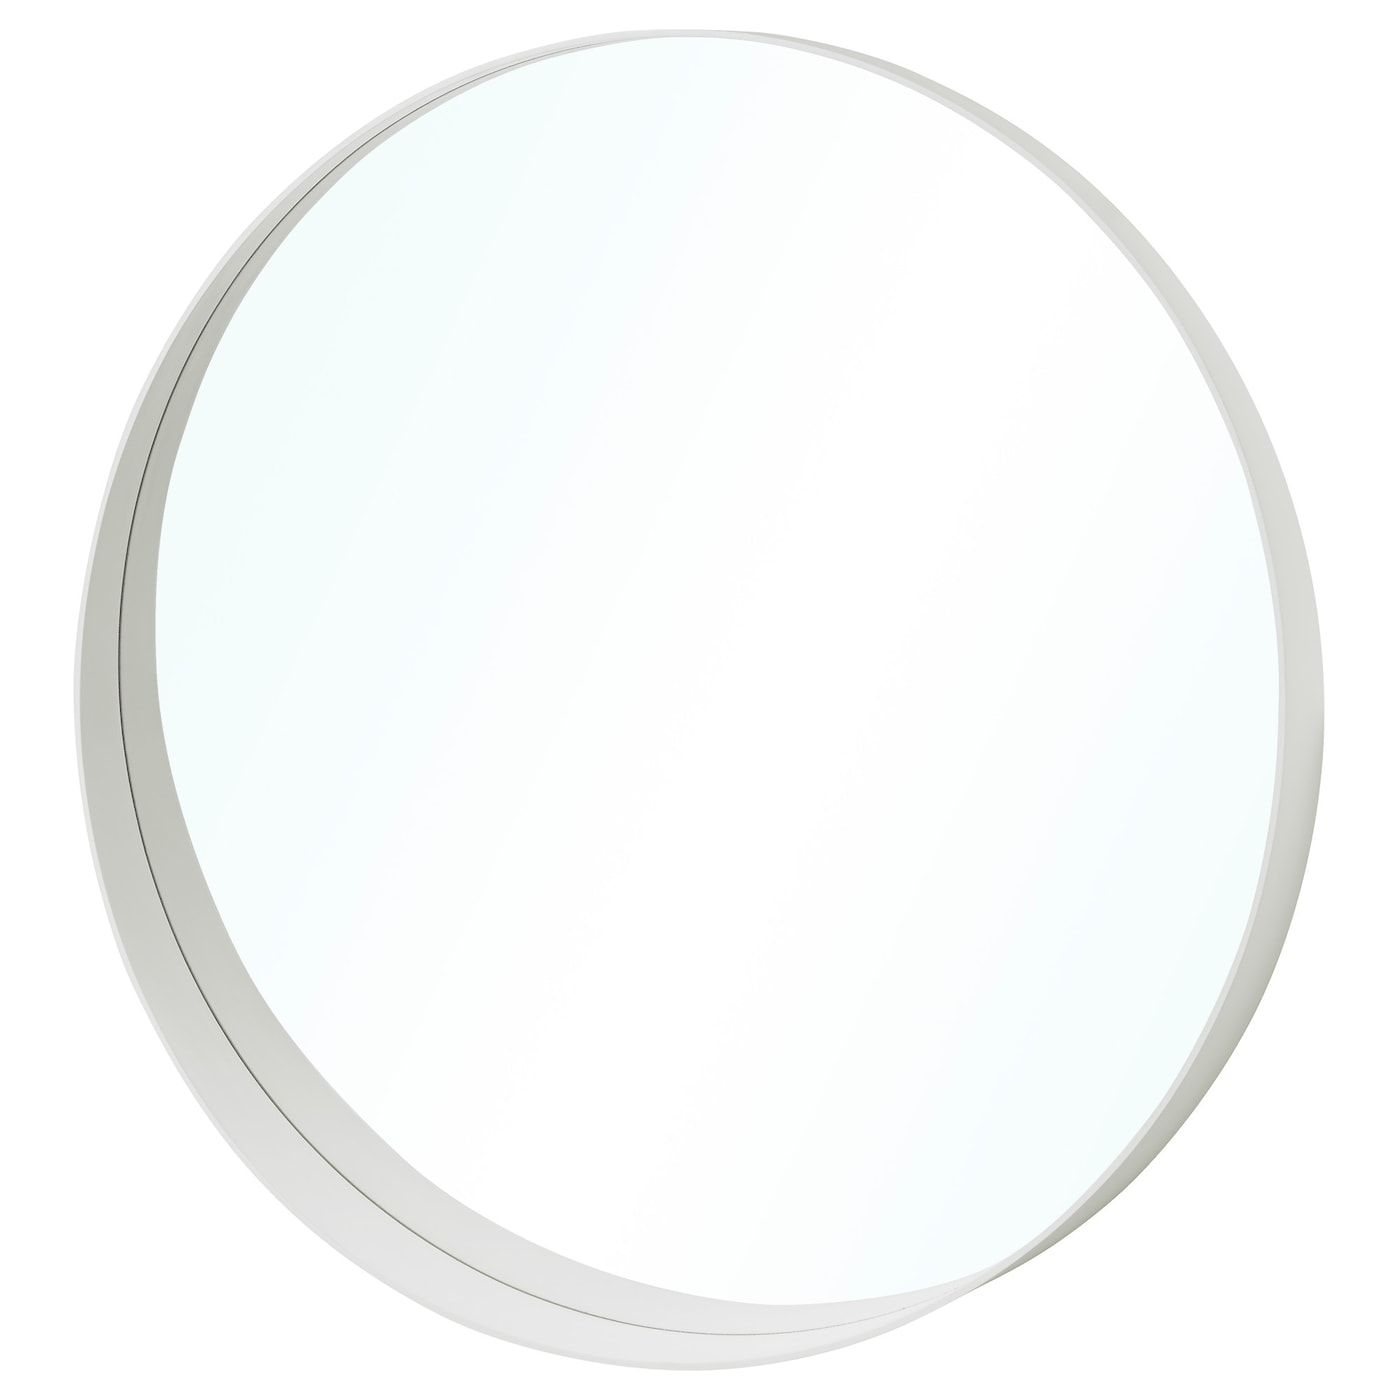 URBNLIVING Round 10cm Glass Mirror Plate